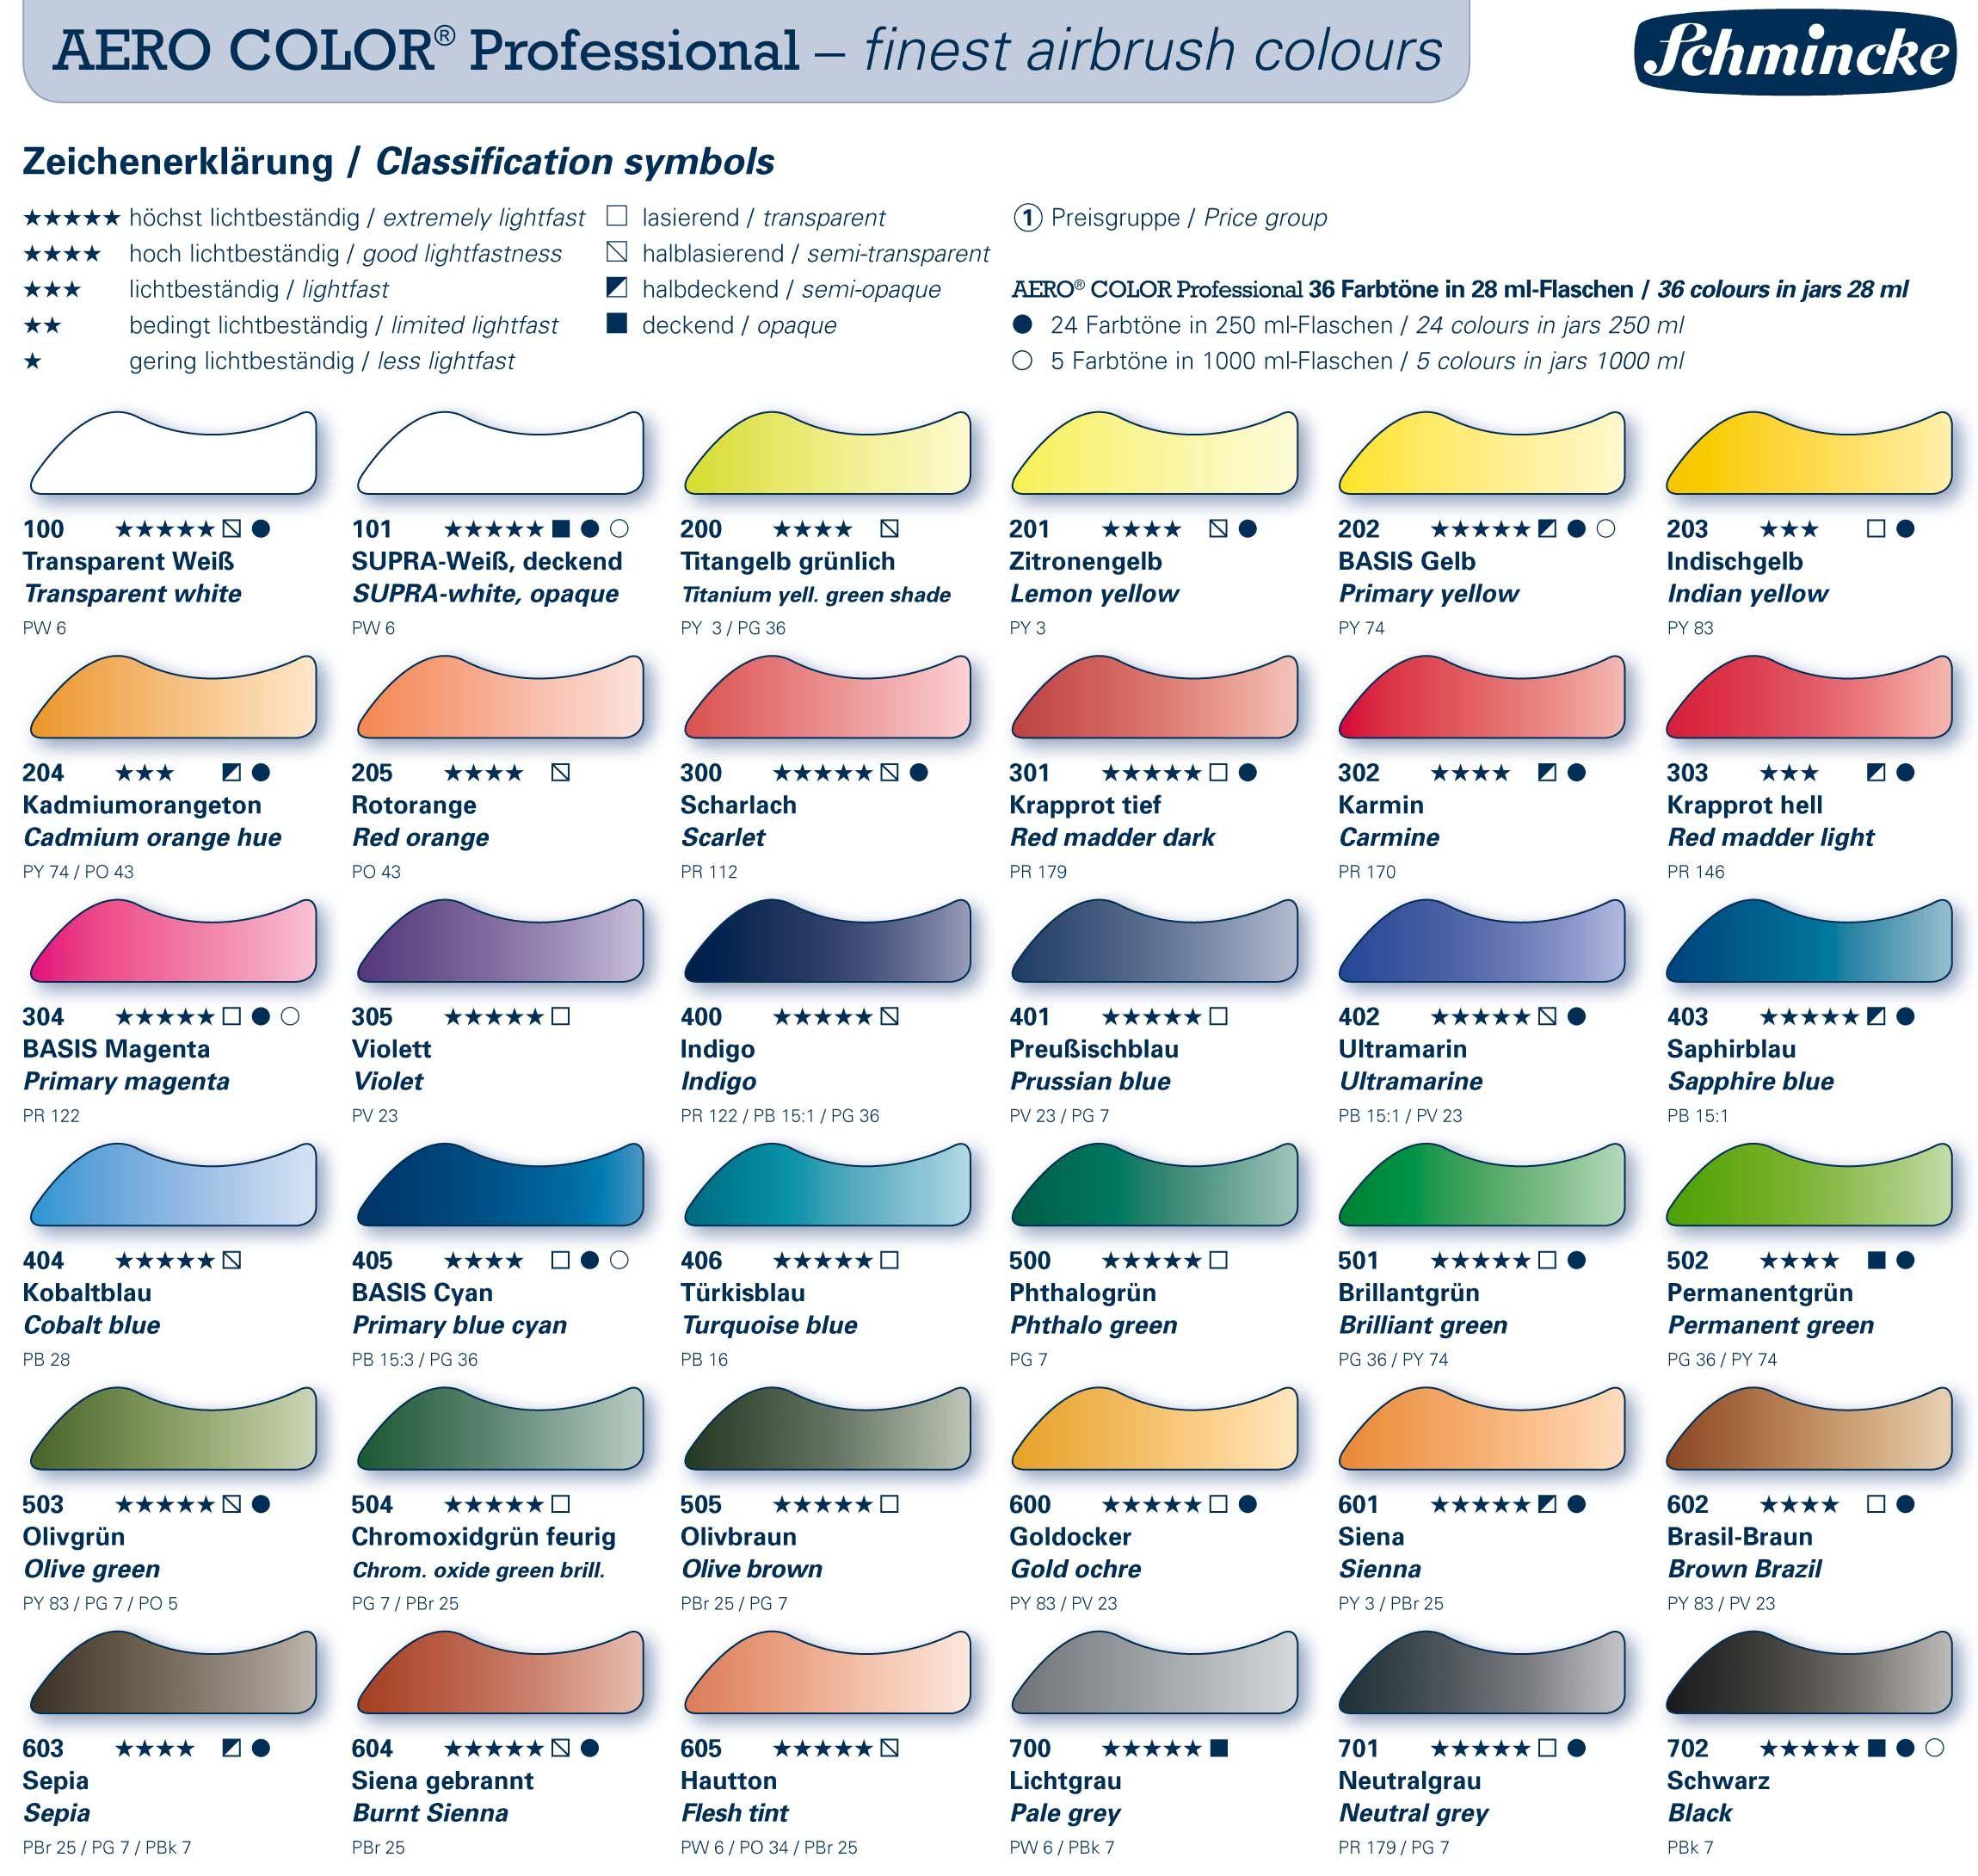 Schmincke Aero Color Professional Inks Colour Chart